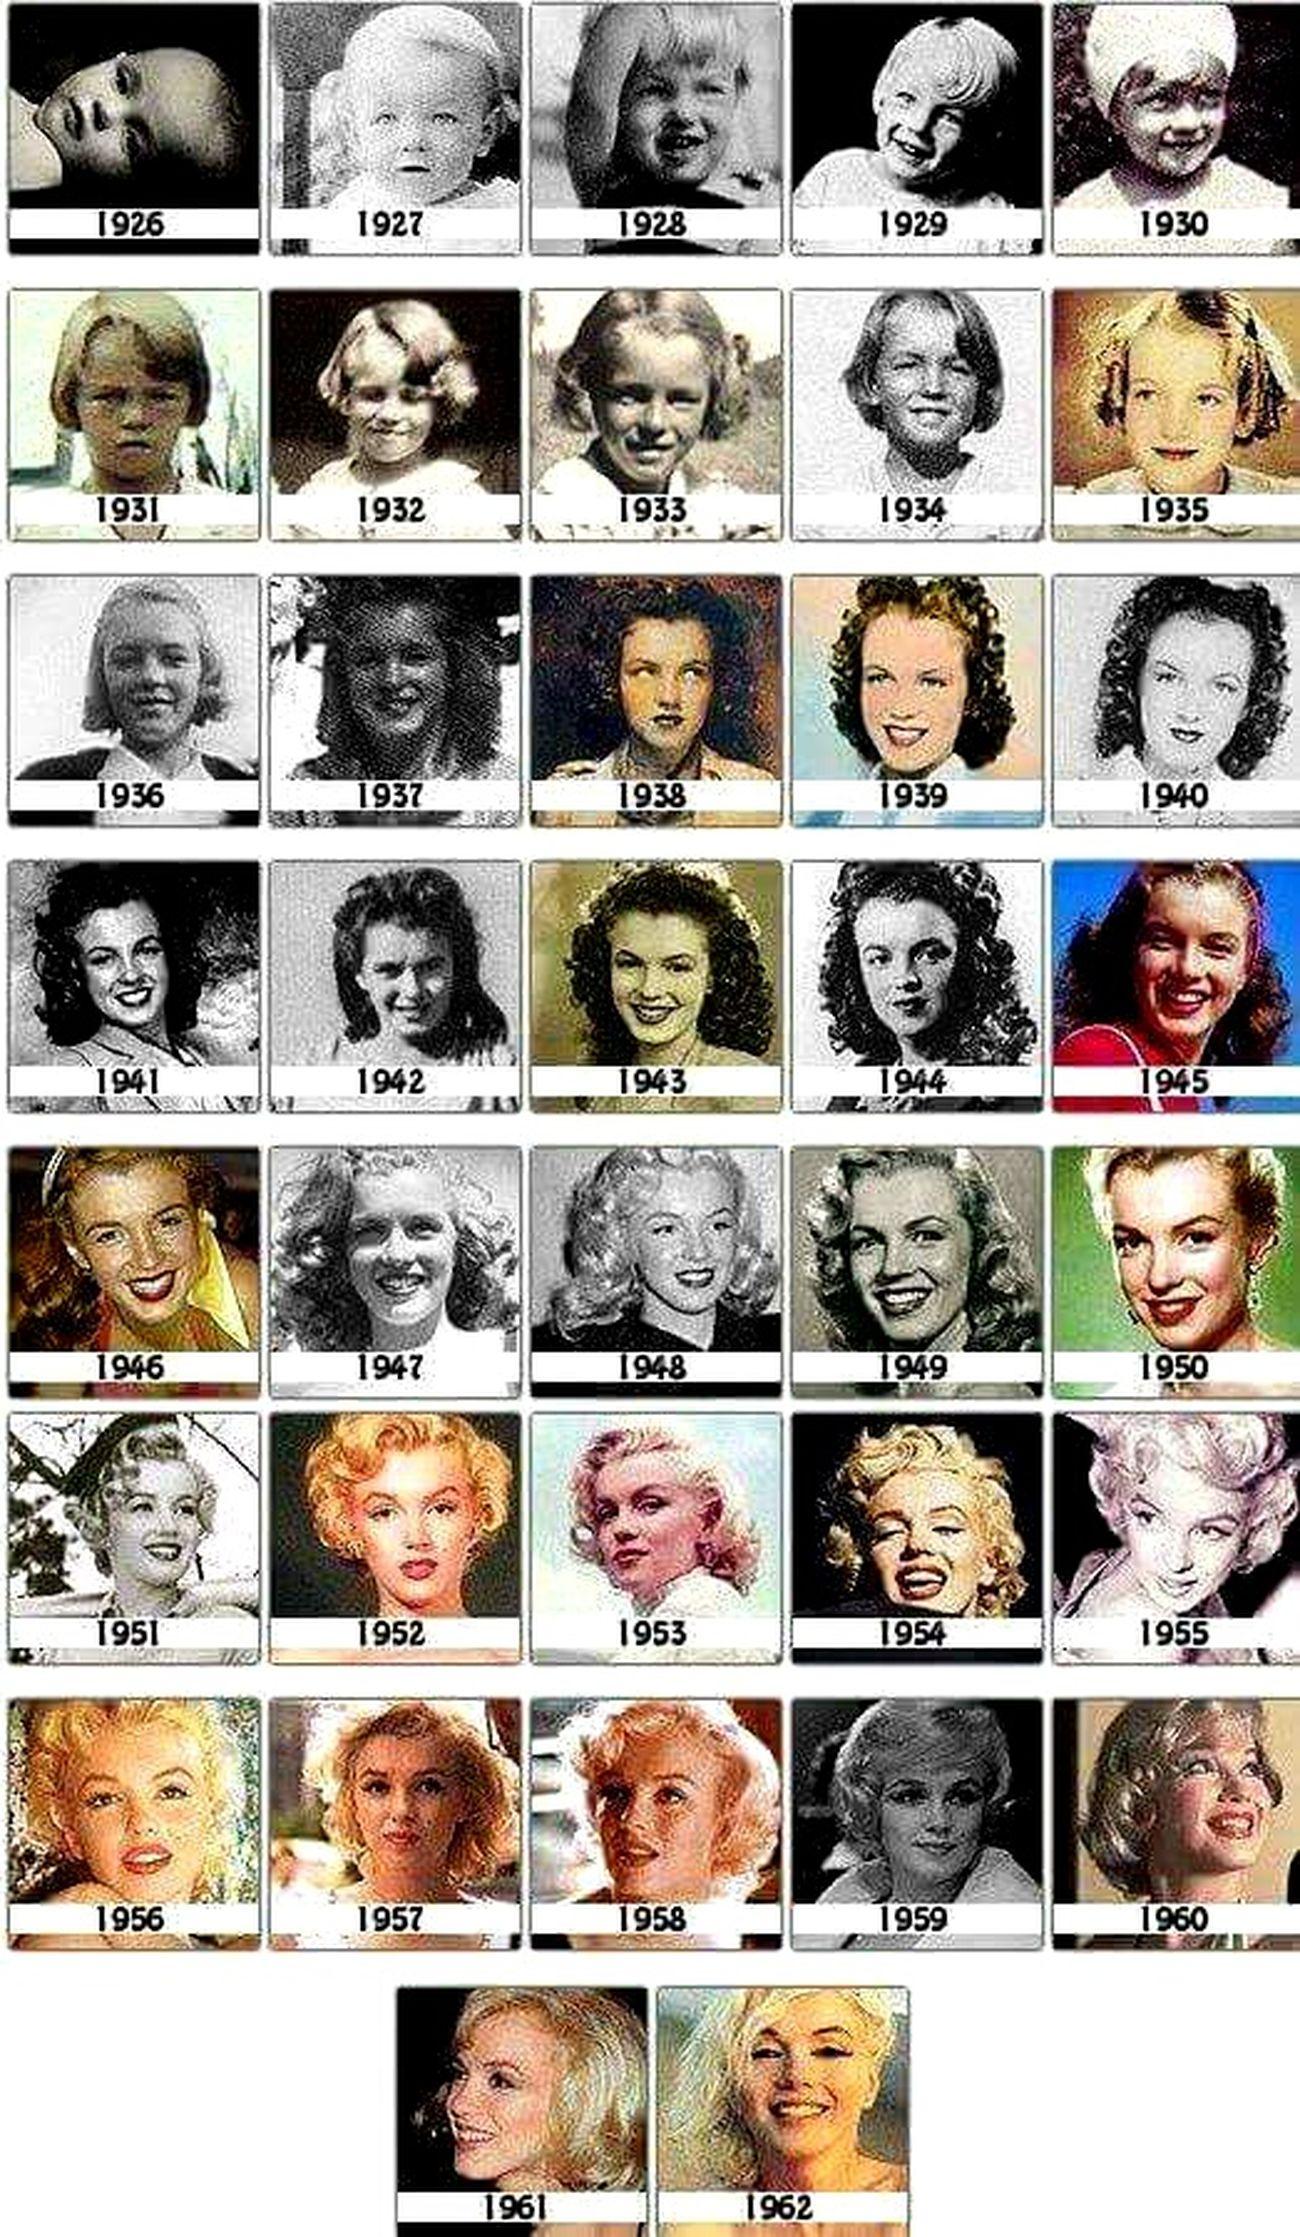 Marilyn Monroe Marilynmonroe Marilyn MarilynMonroe♡ Marilyn Monroe <3 Marilyn Monroe Marilyn<3 Normajeane Norma Jeane